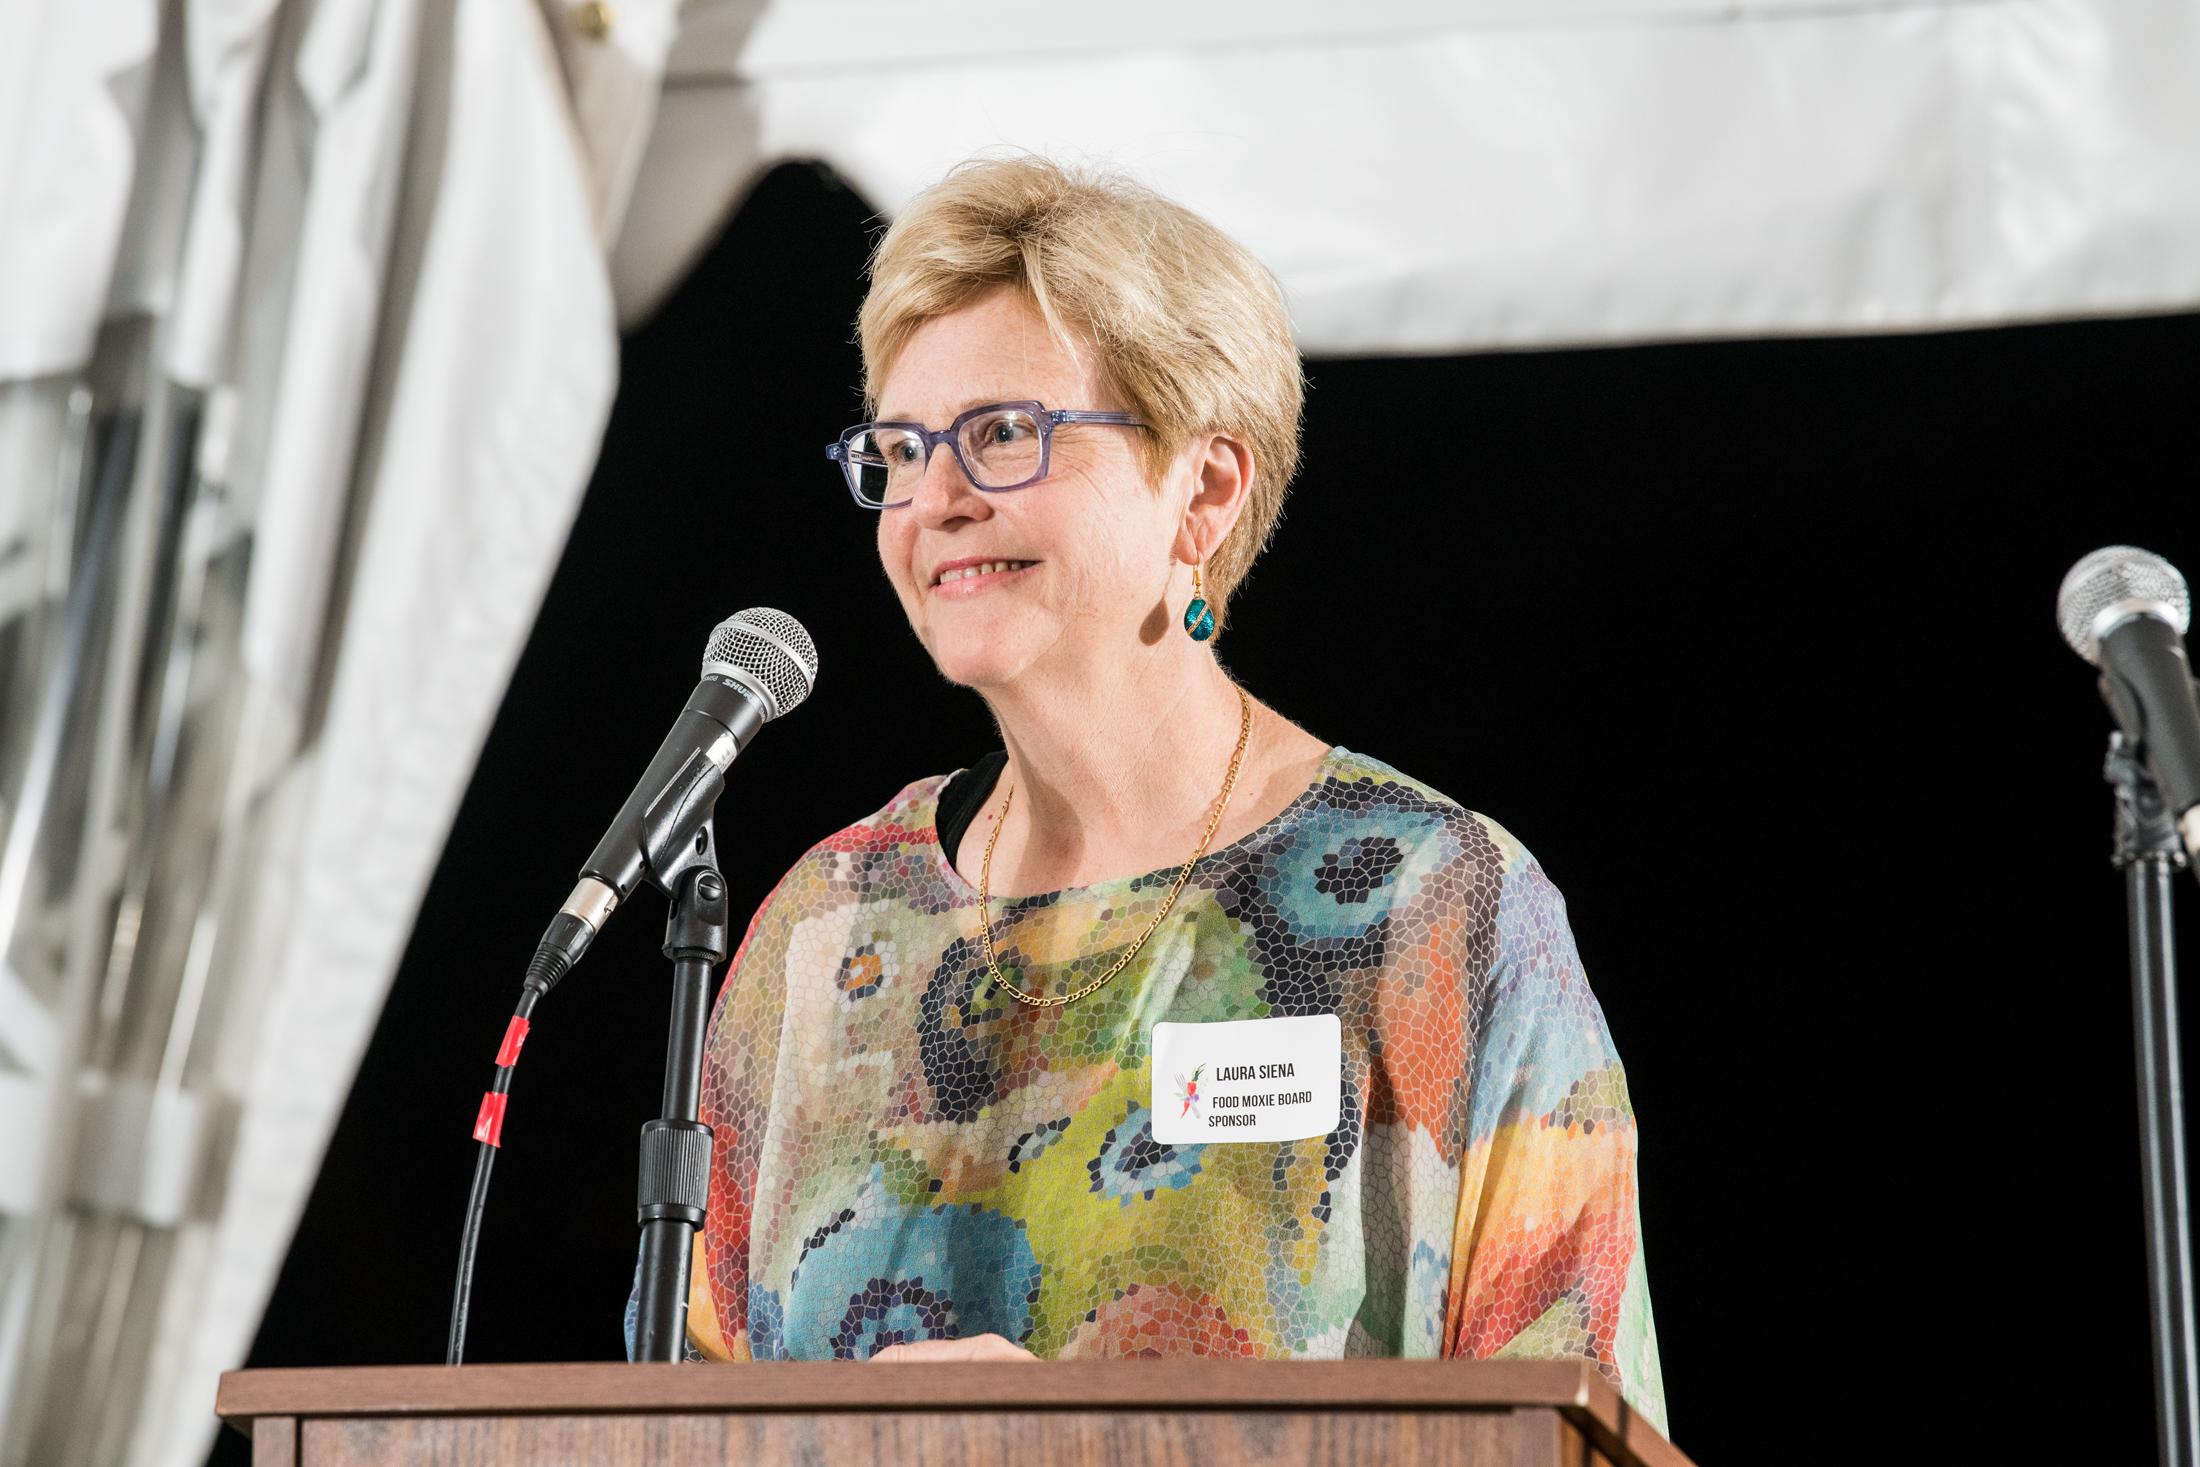 Laura M. Siena